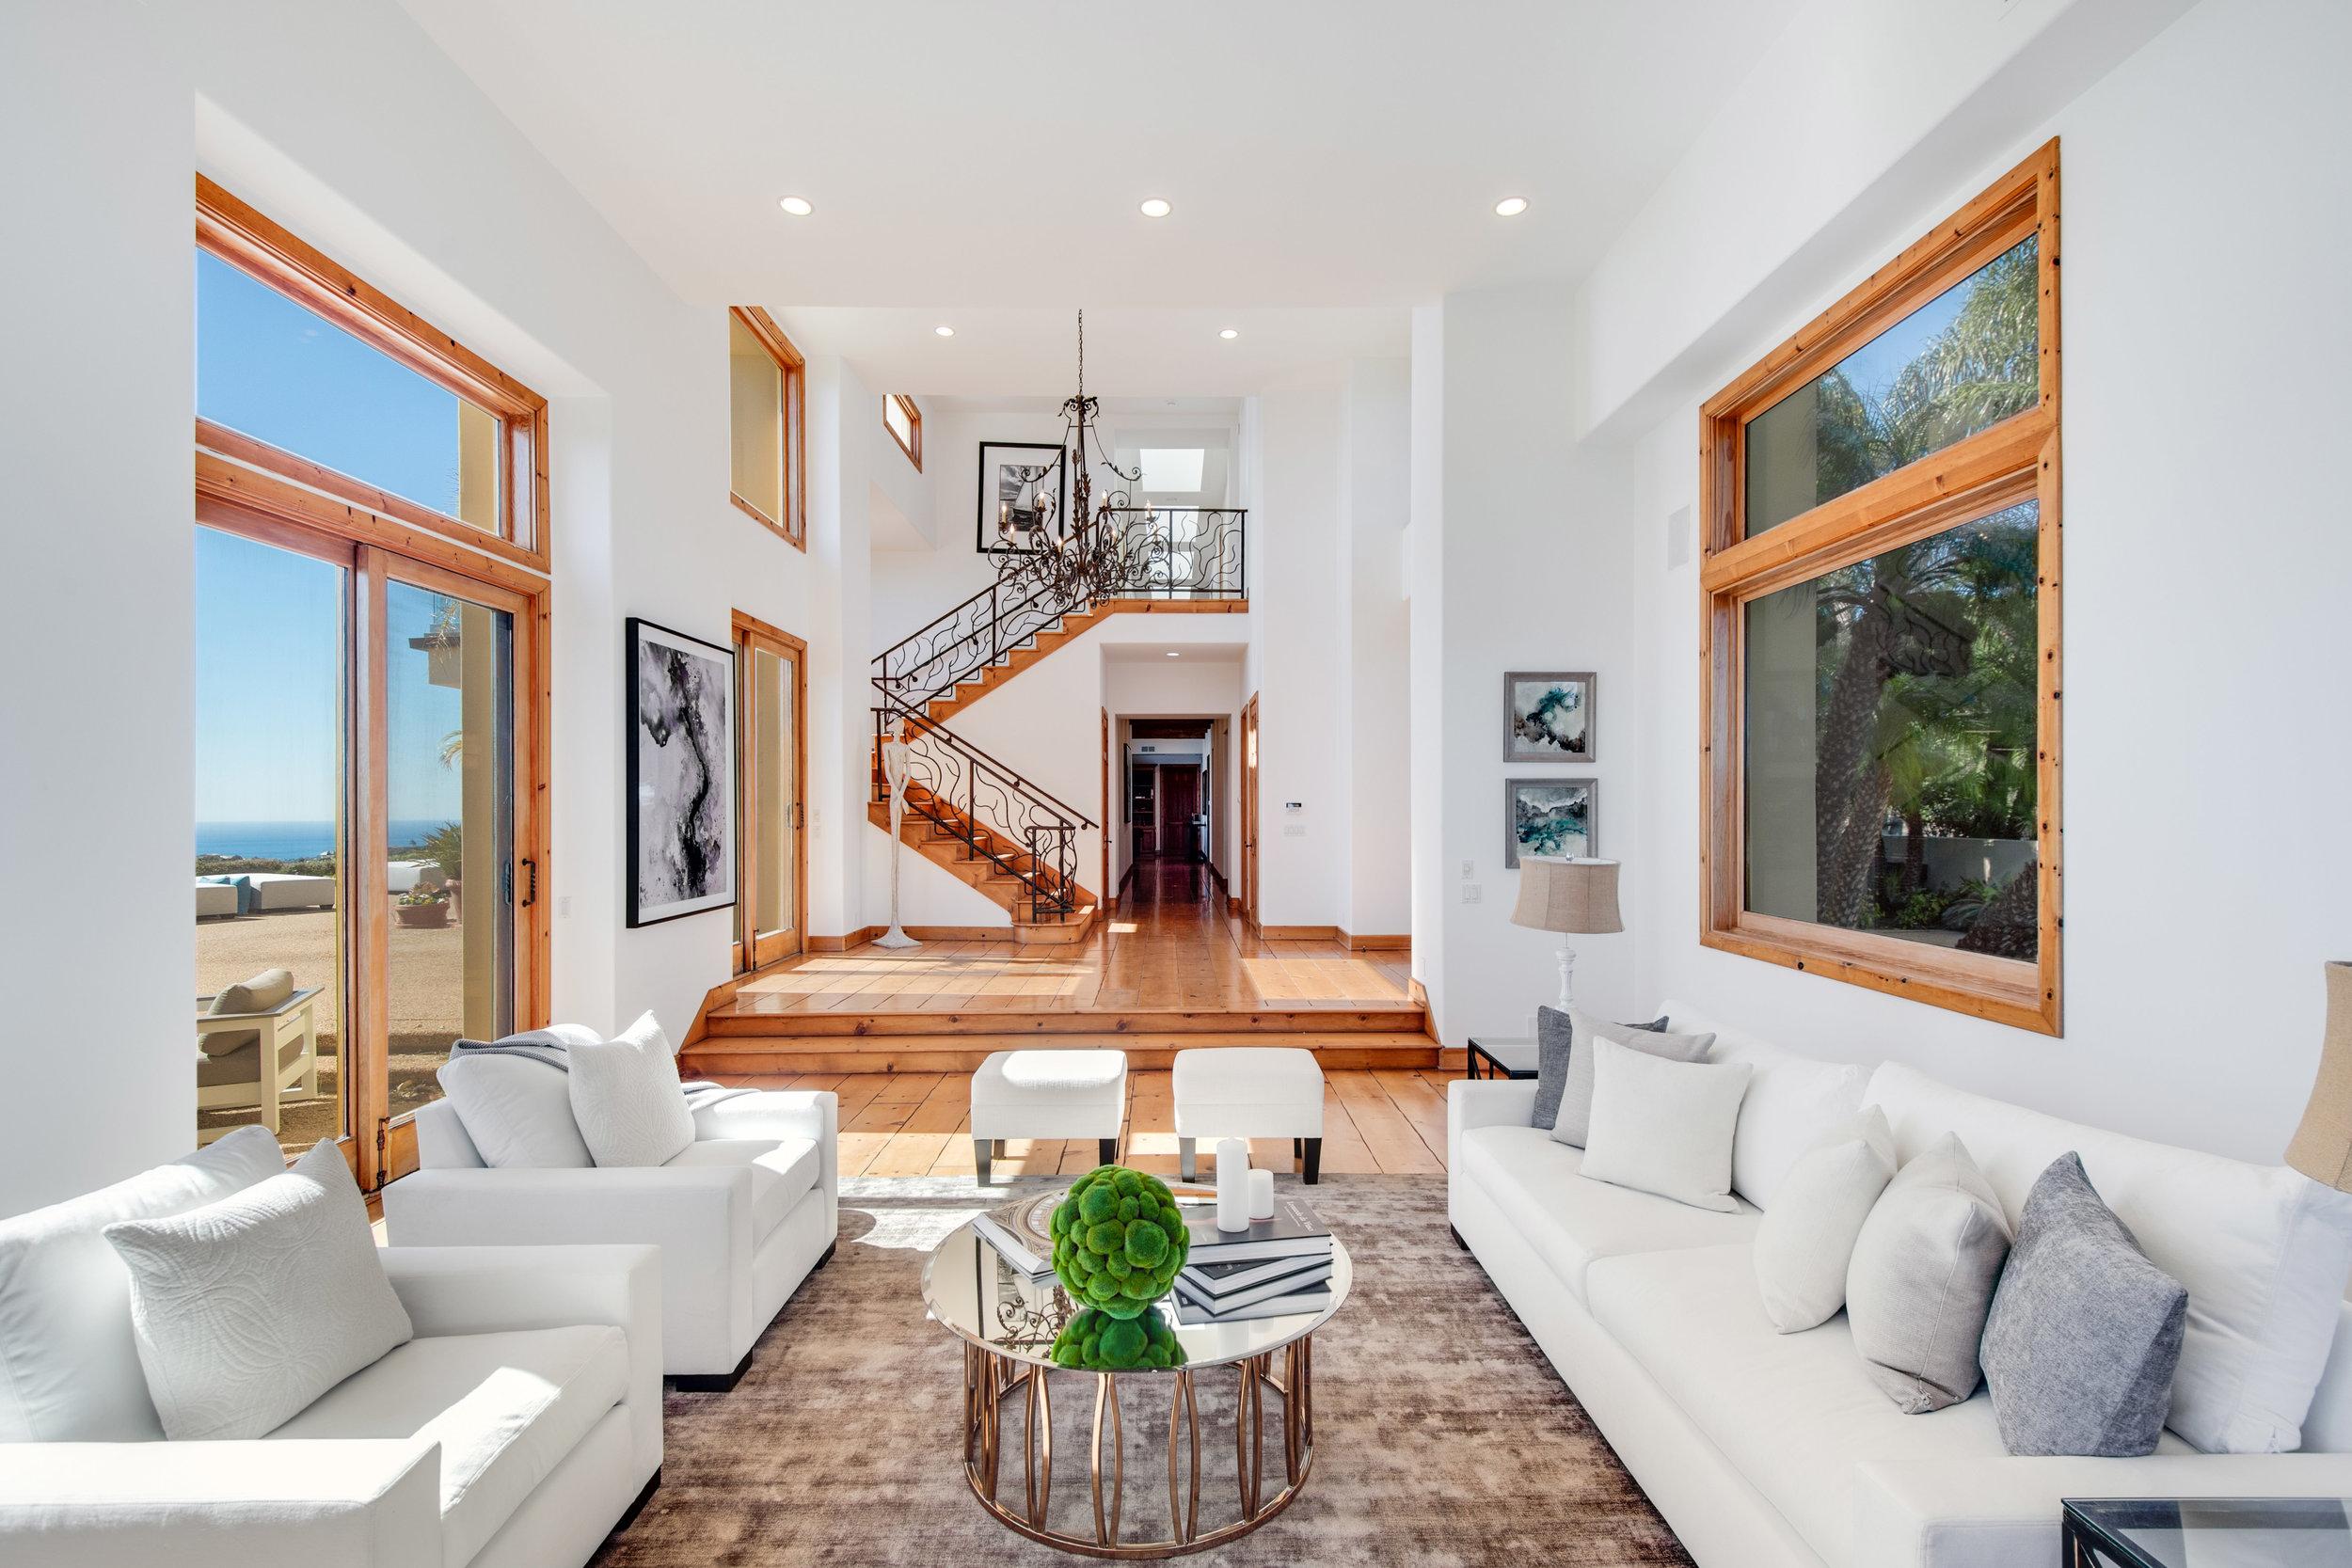 004 Entry 27475 Latigo Bay View Drive For Sale Lease The Malibu Life Team Luxury Real Estate.jpg